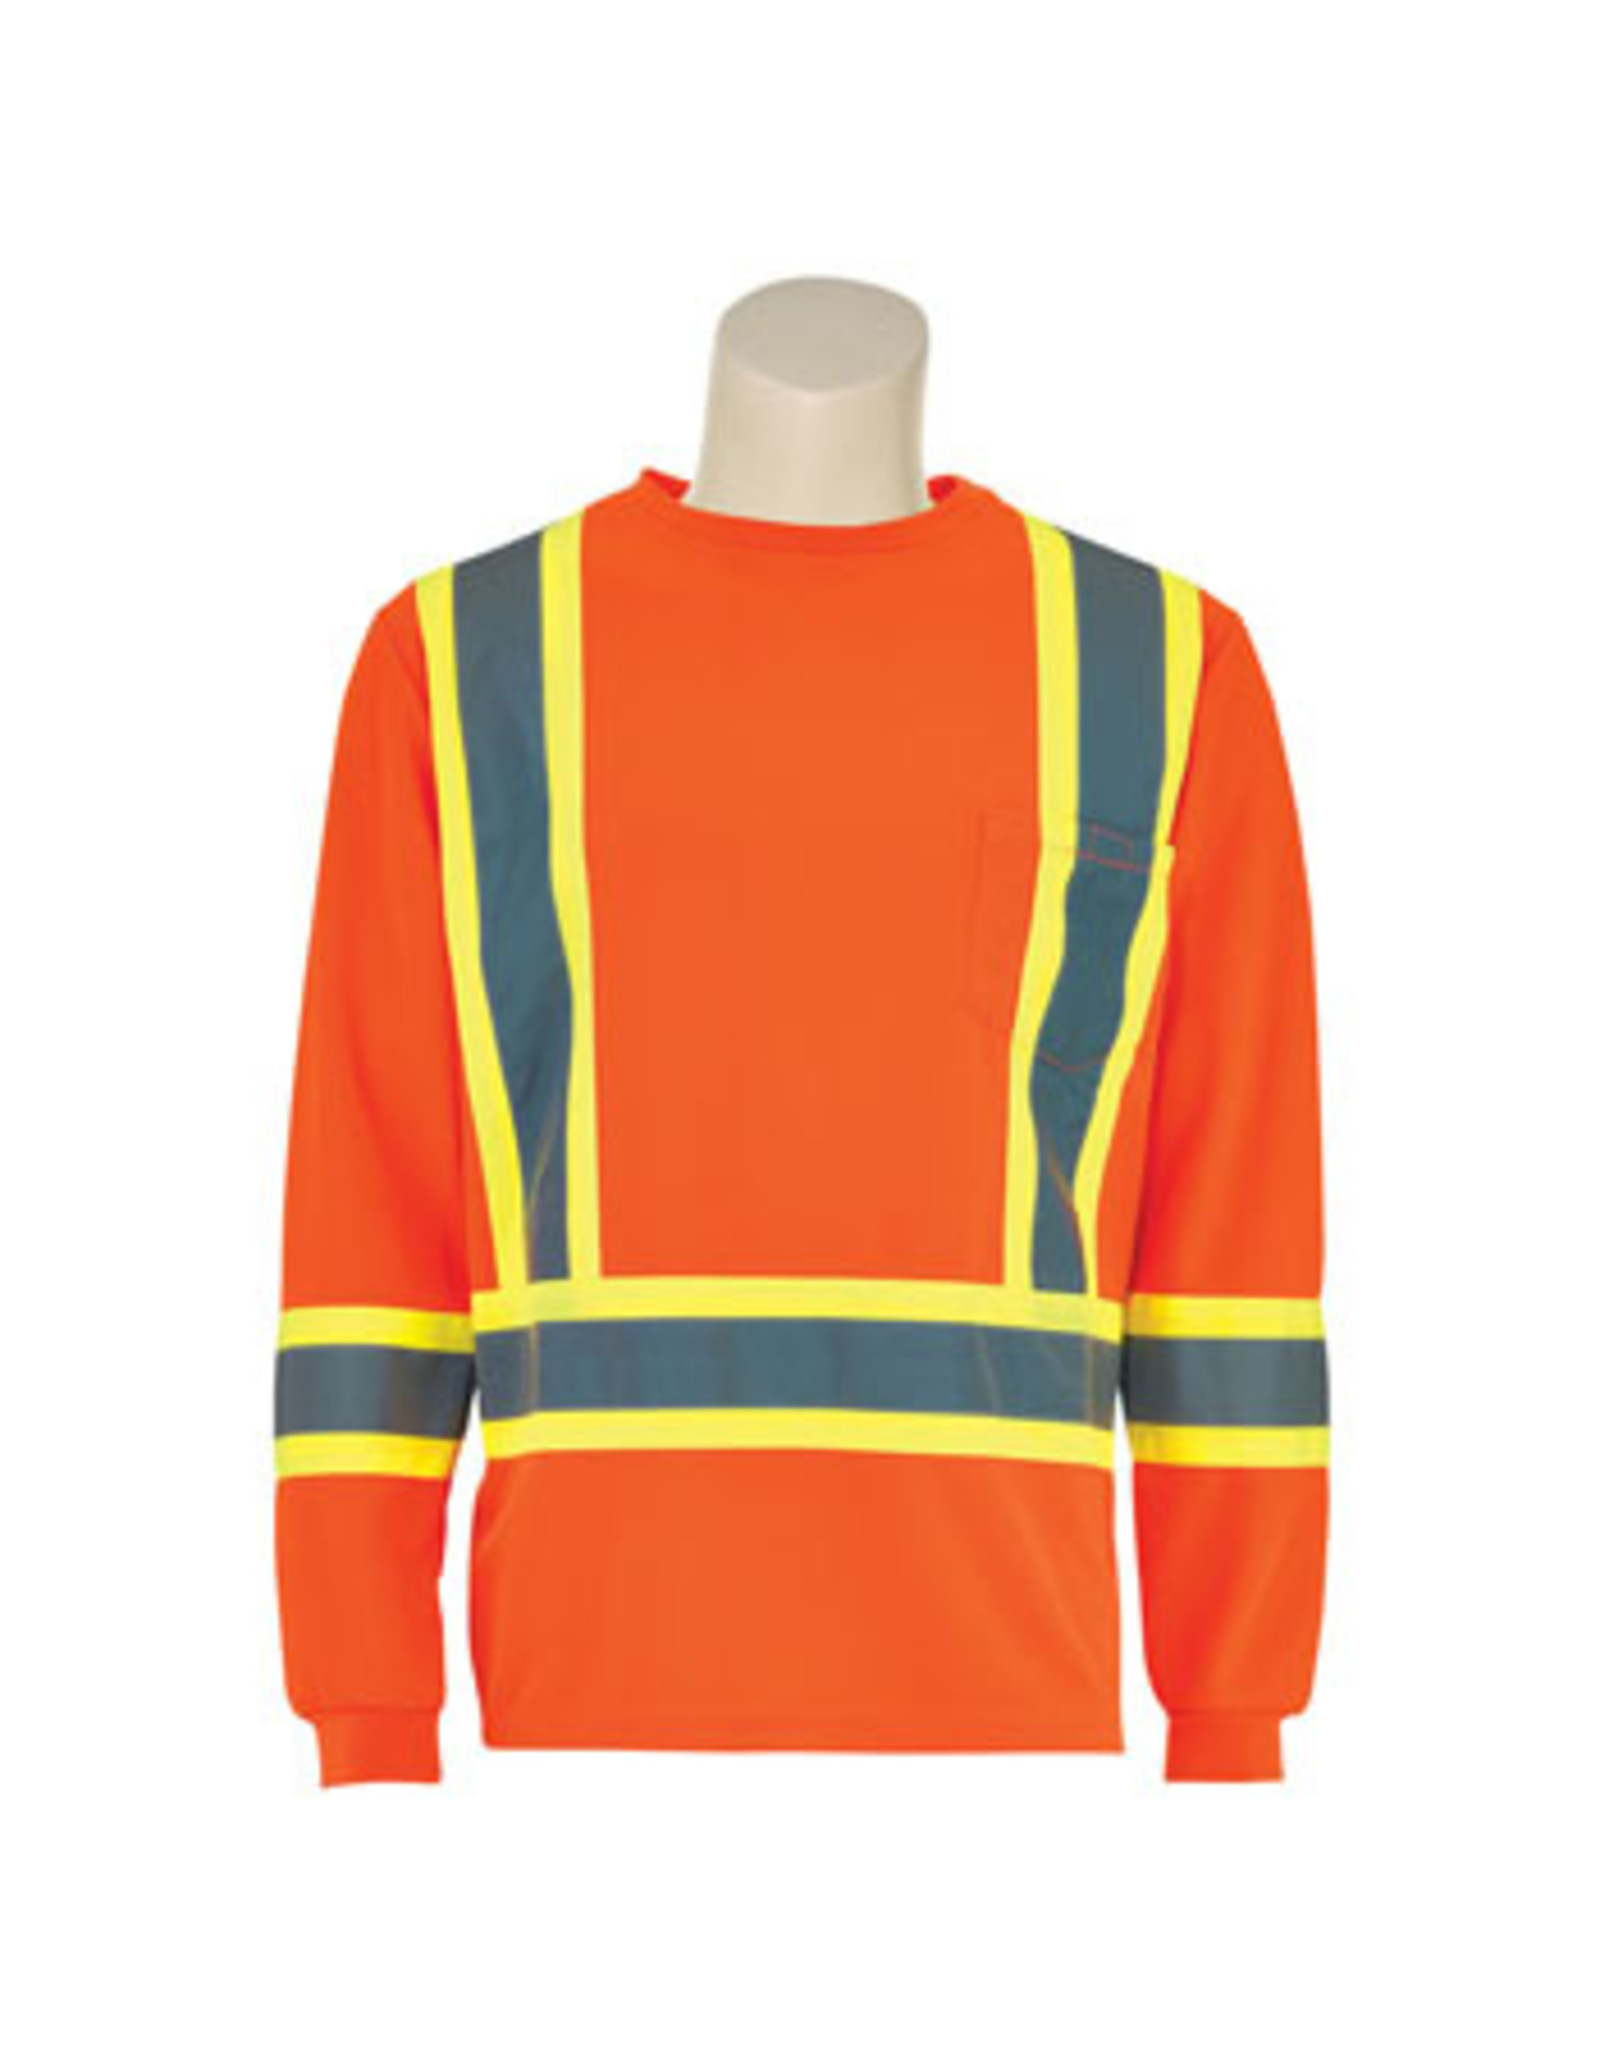 Orange Hi - Viz CSA Class 2 Polyester Long Sleeve